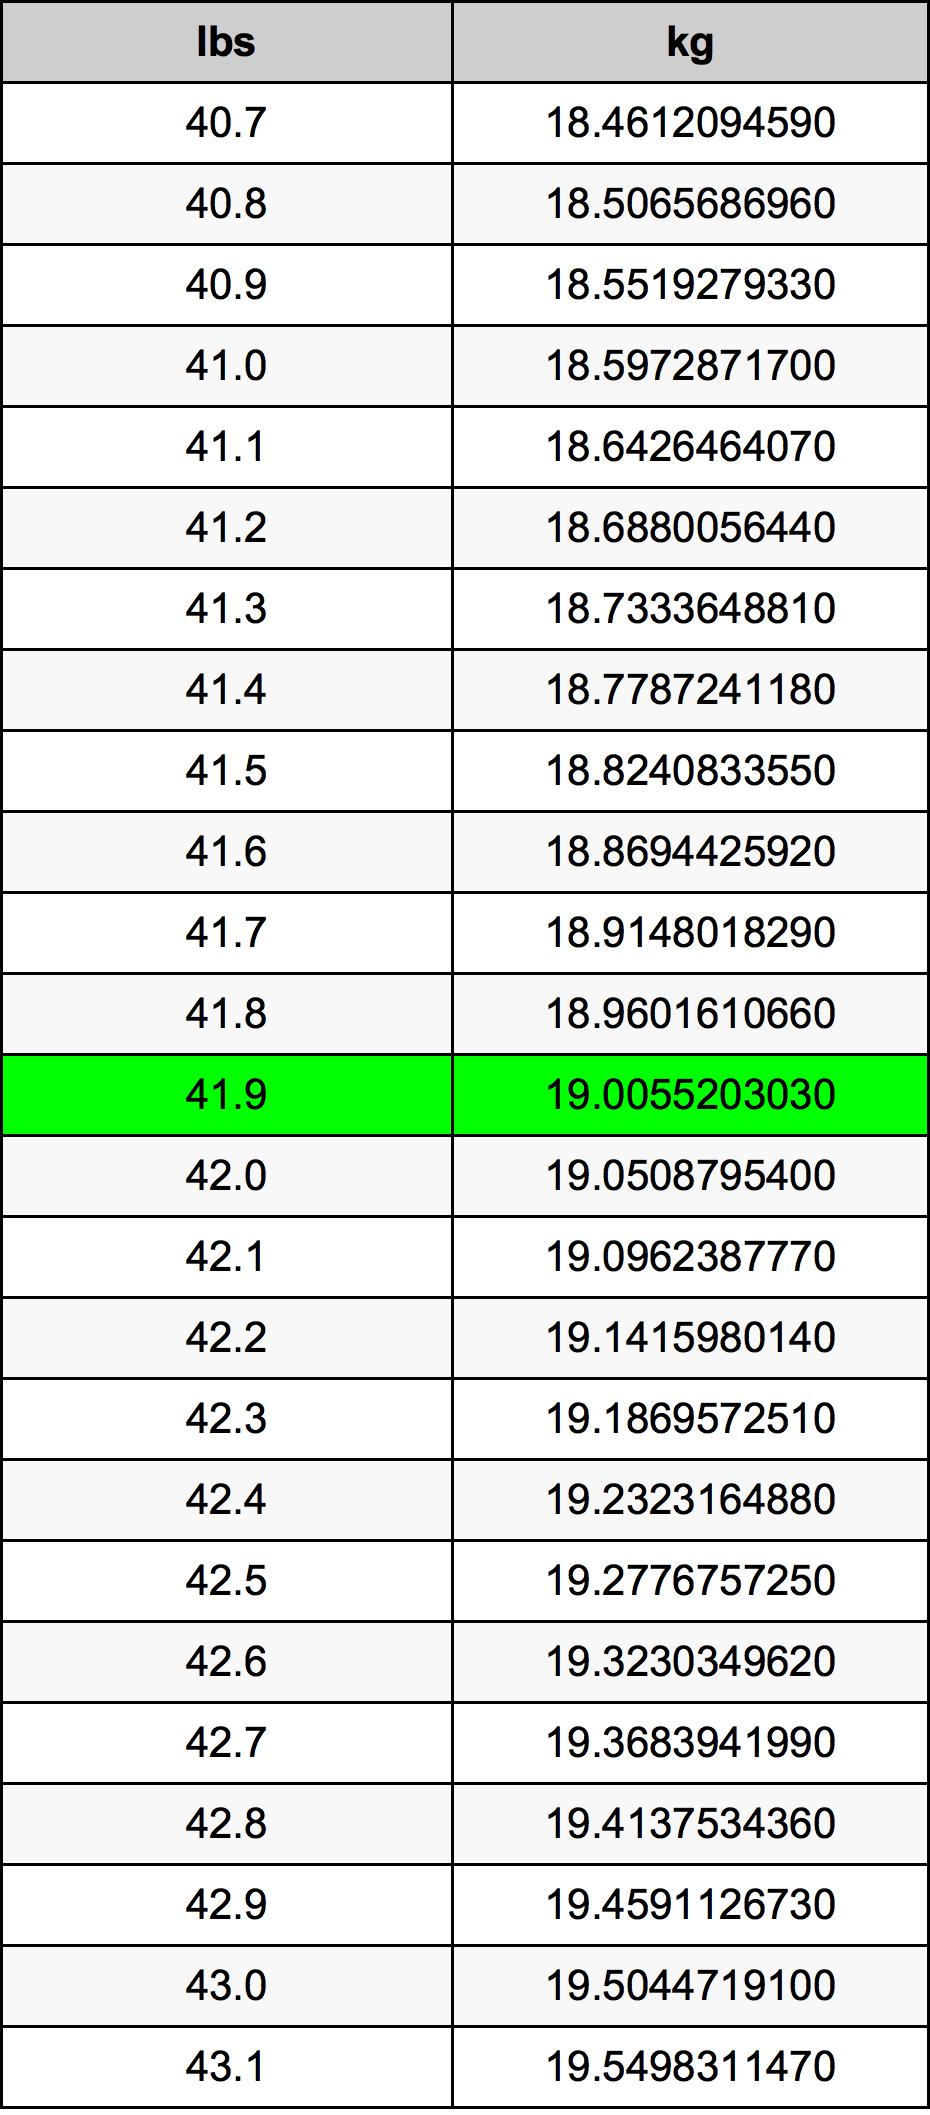 41.9 Libra konverteringstabellen